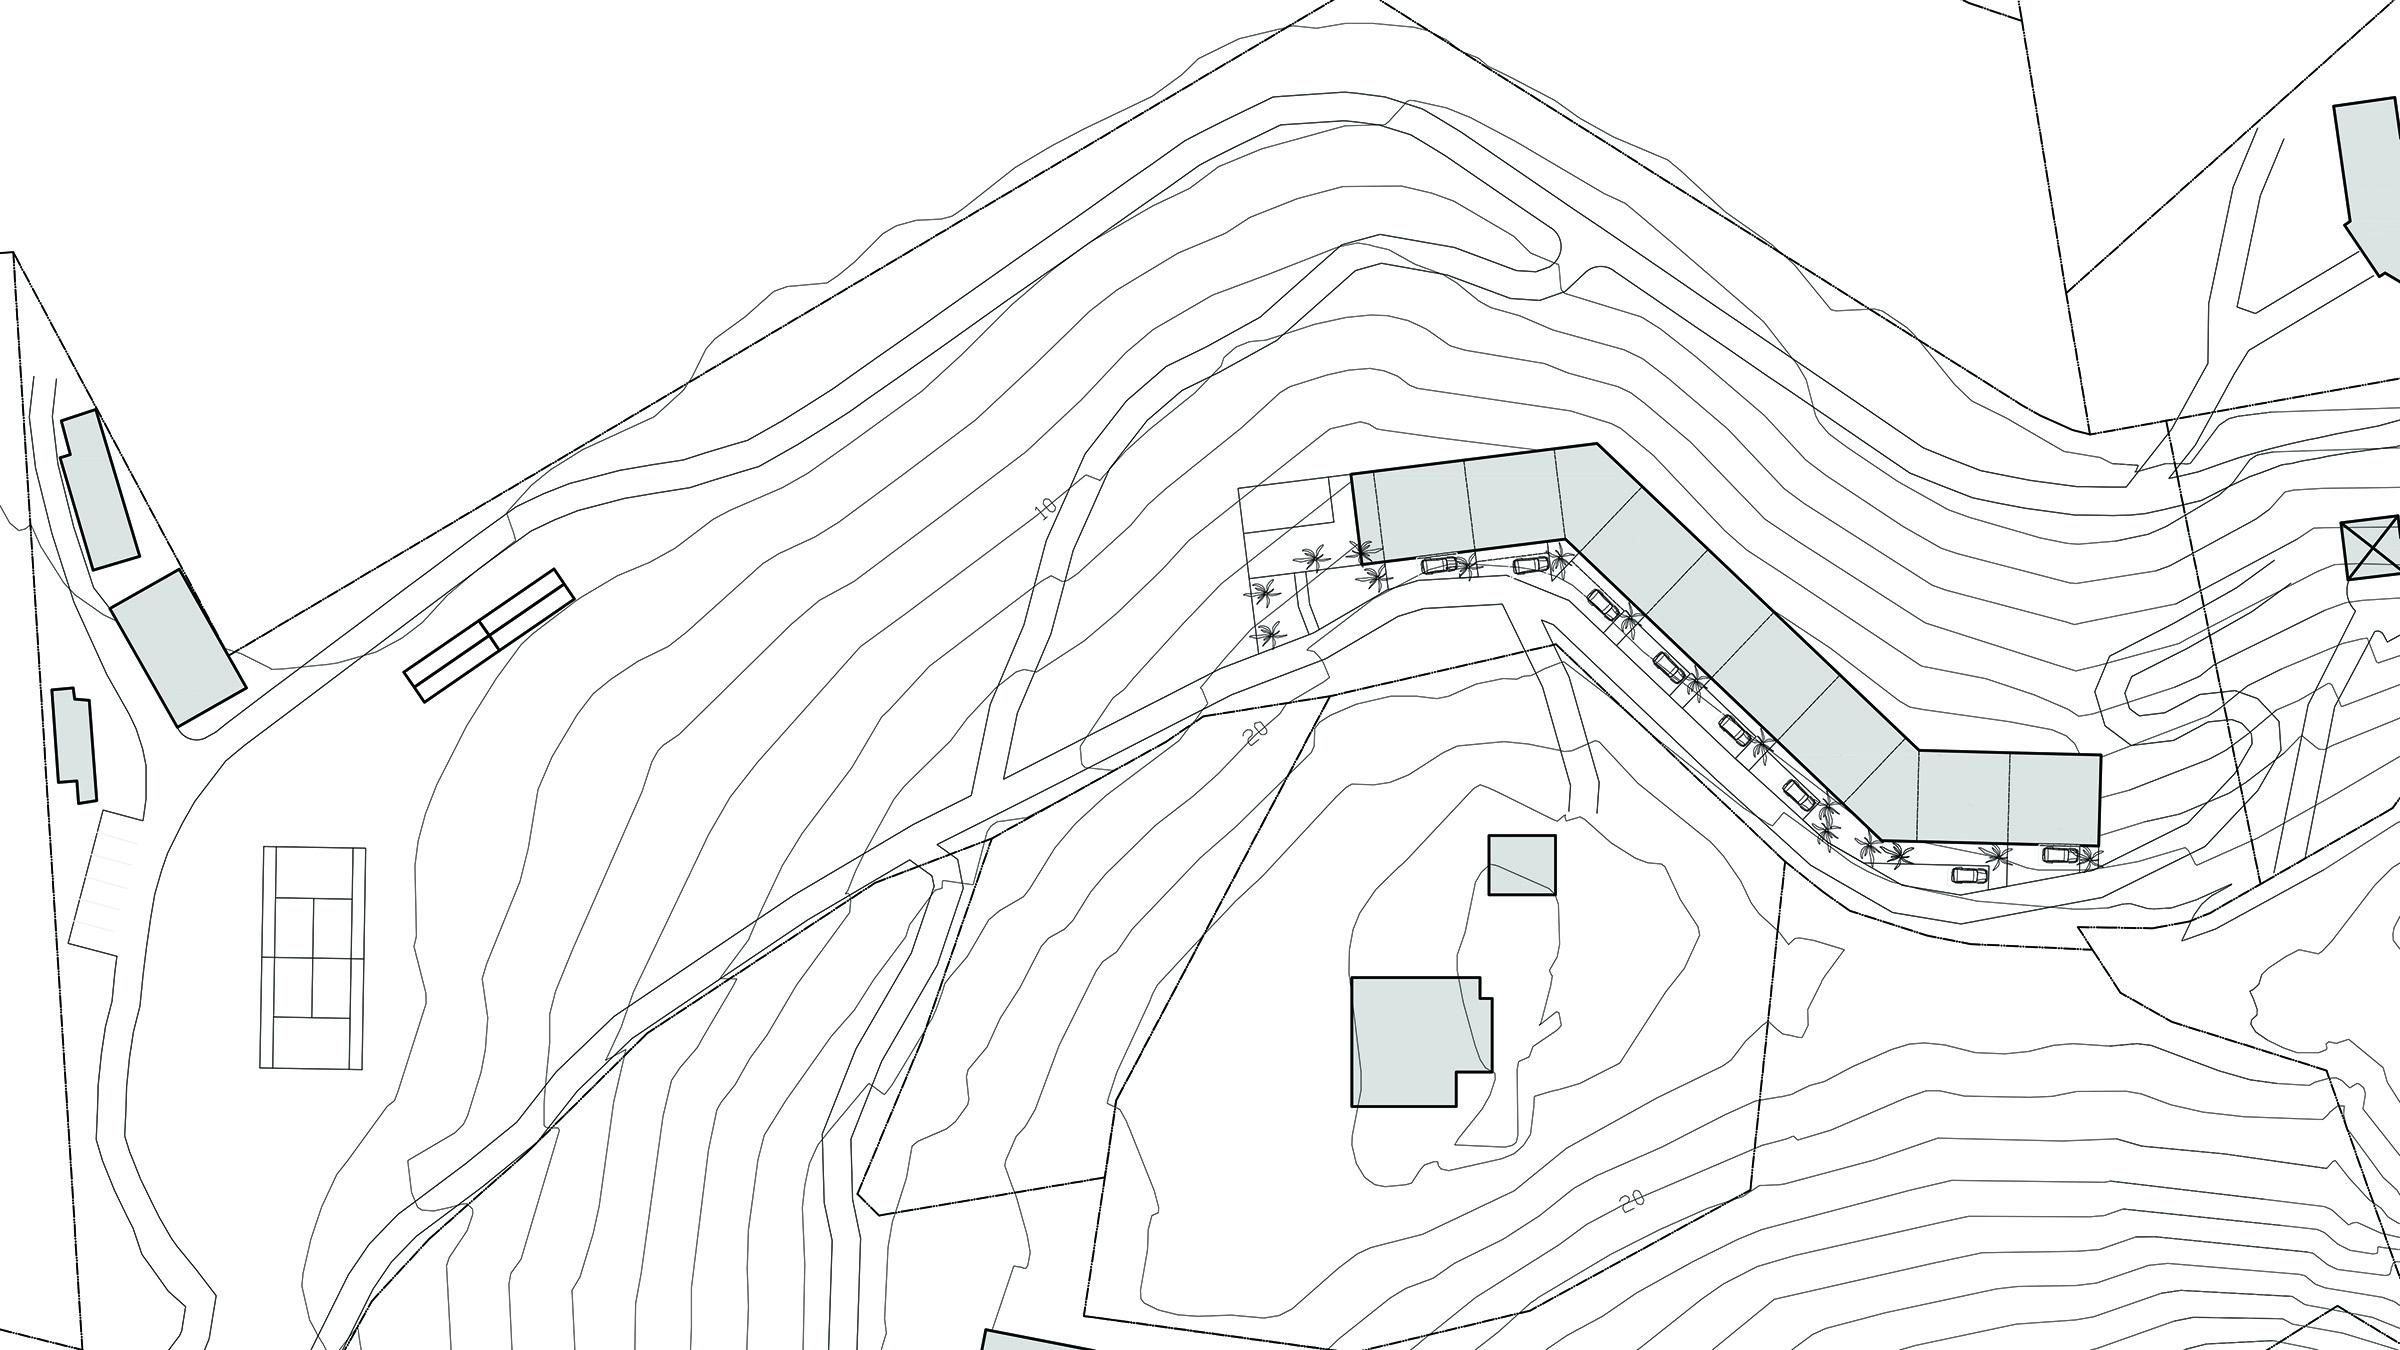 MTAD_MANSION HALL SITE PLAN 01.jpg